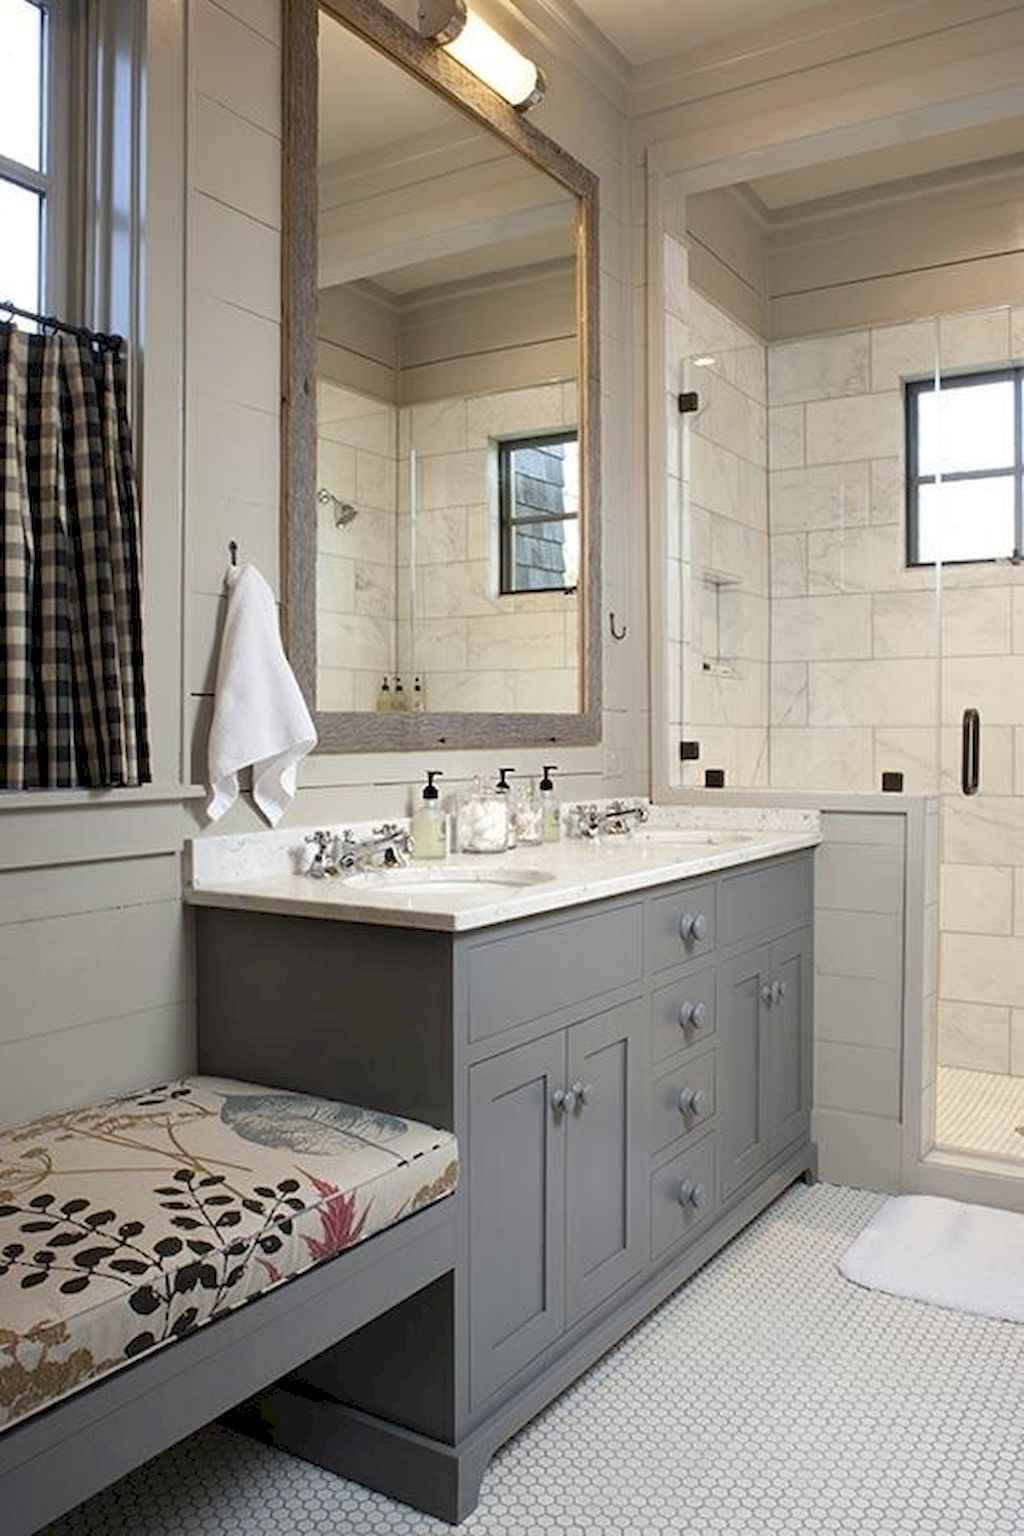 125 awesome farmhouse bathroom vanity remodel ideas (62)